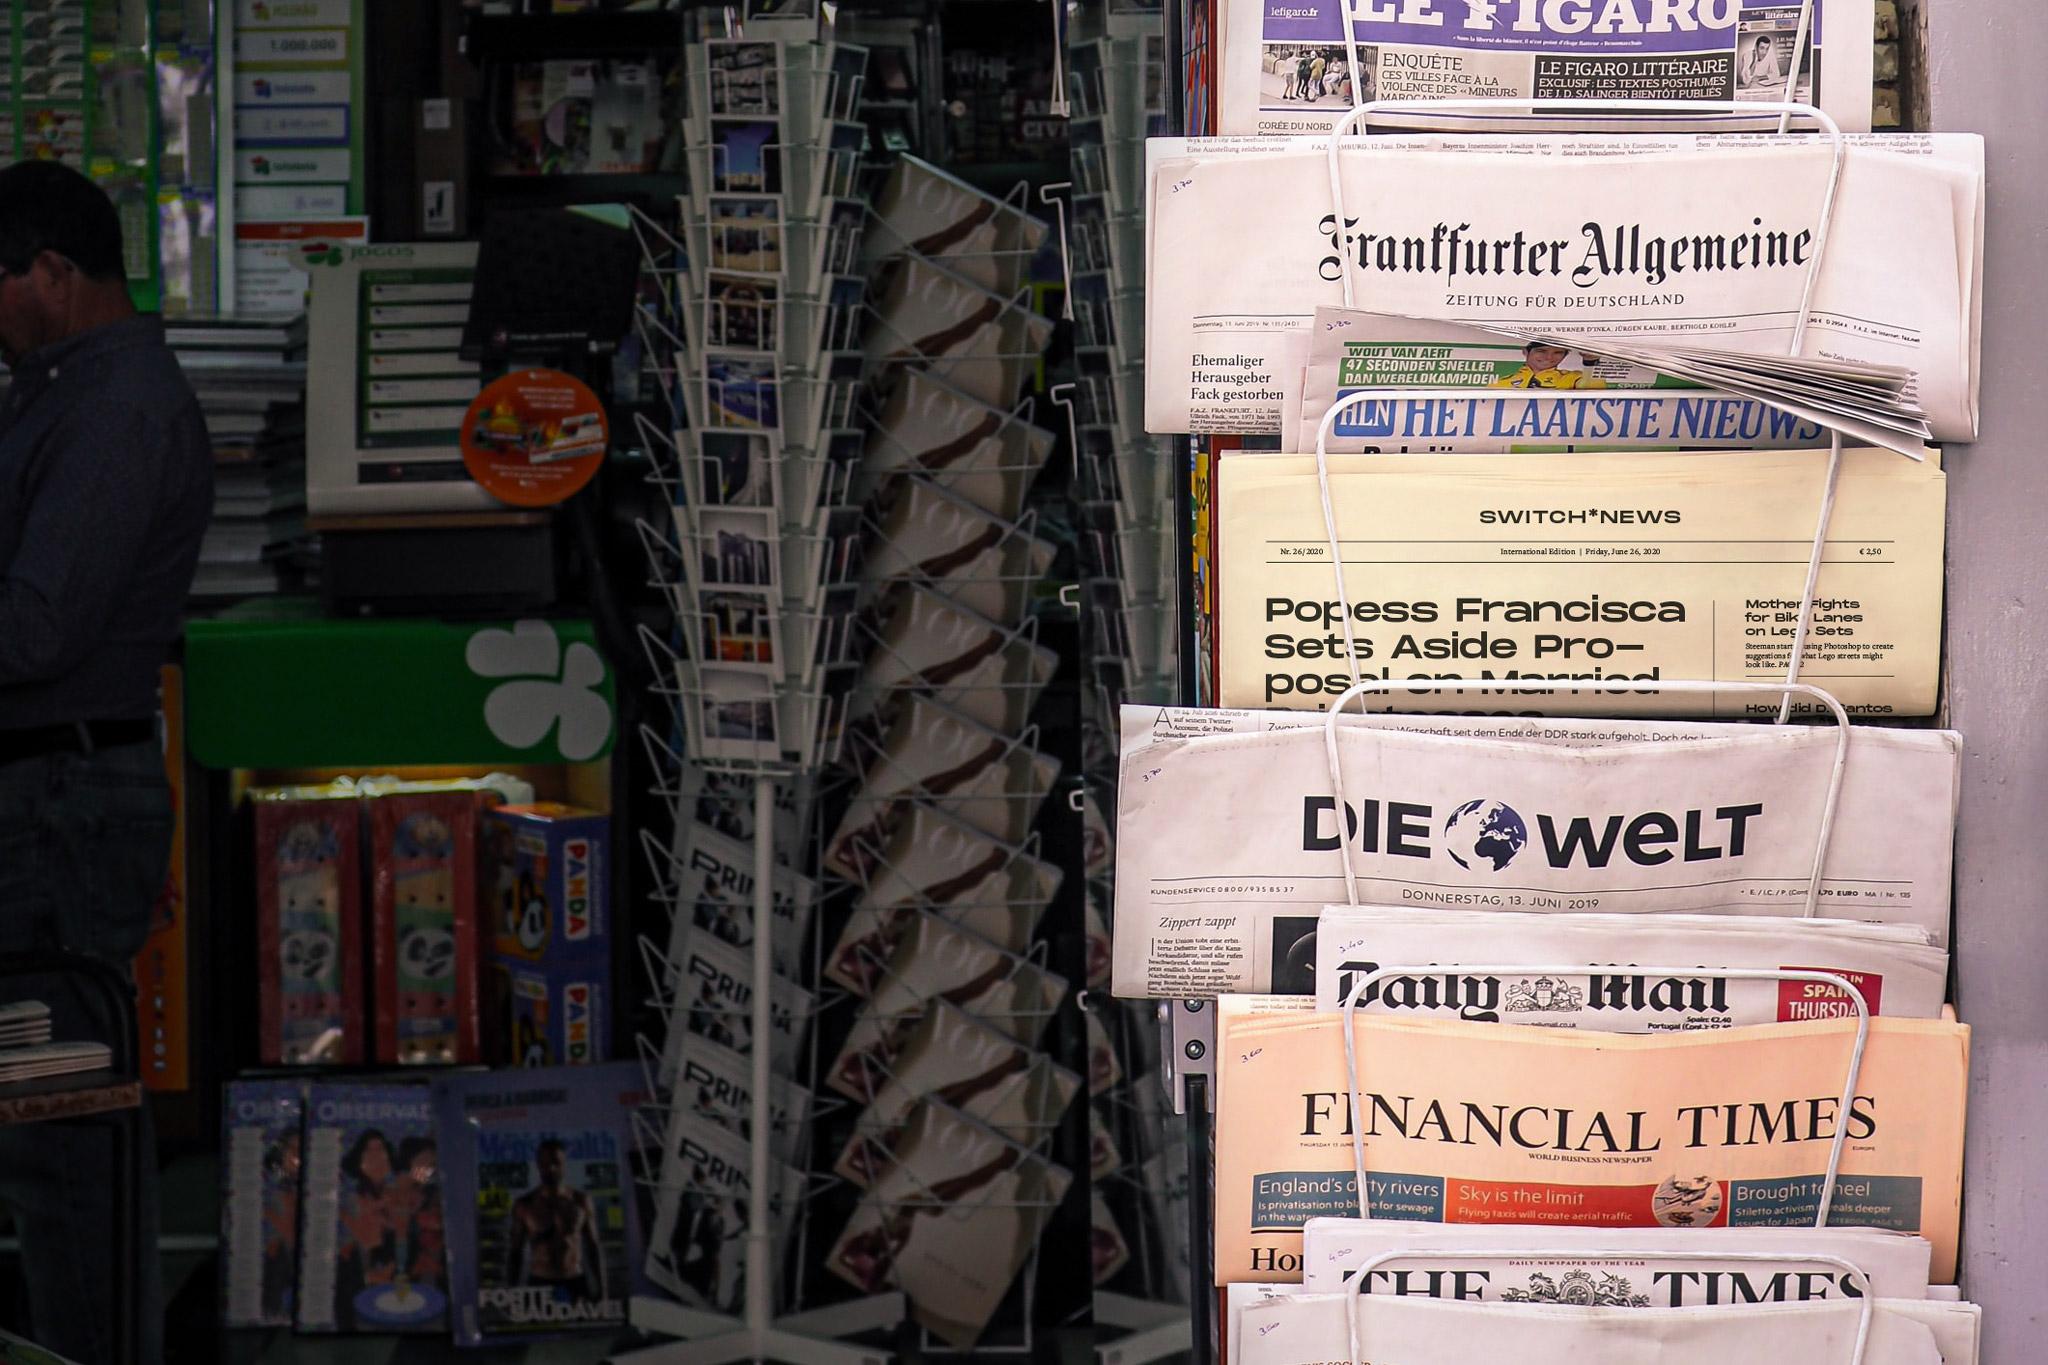 International press at display at a newsstand.